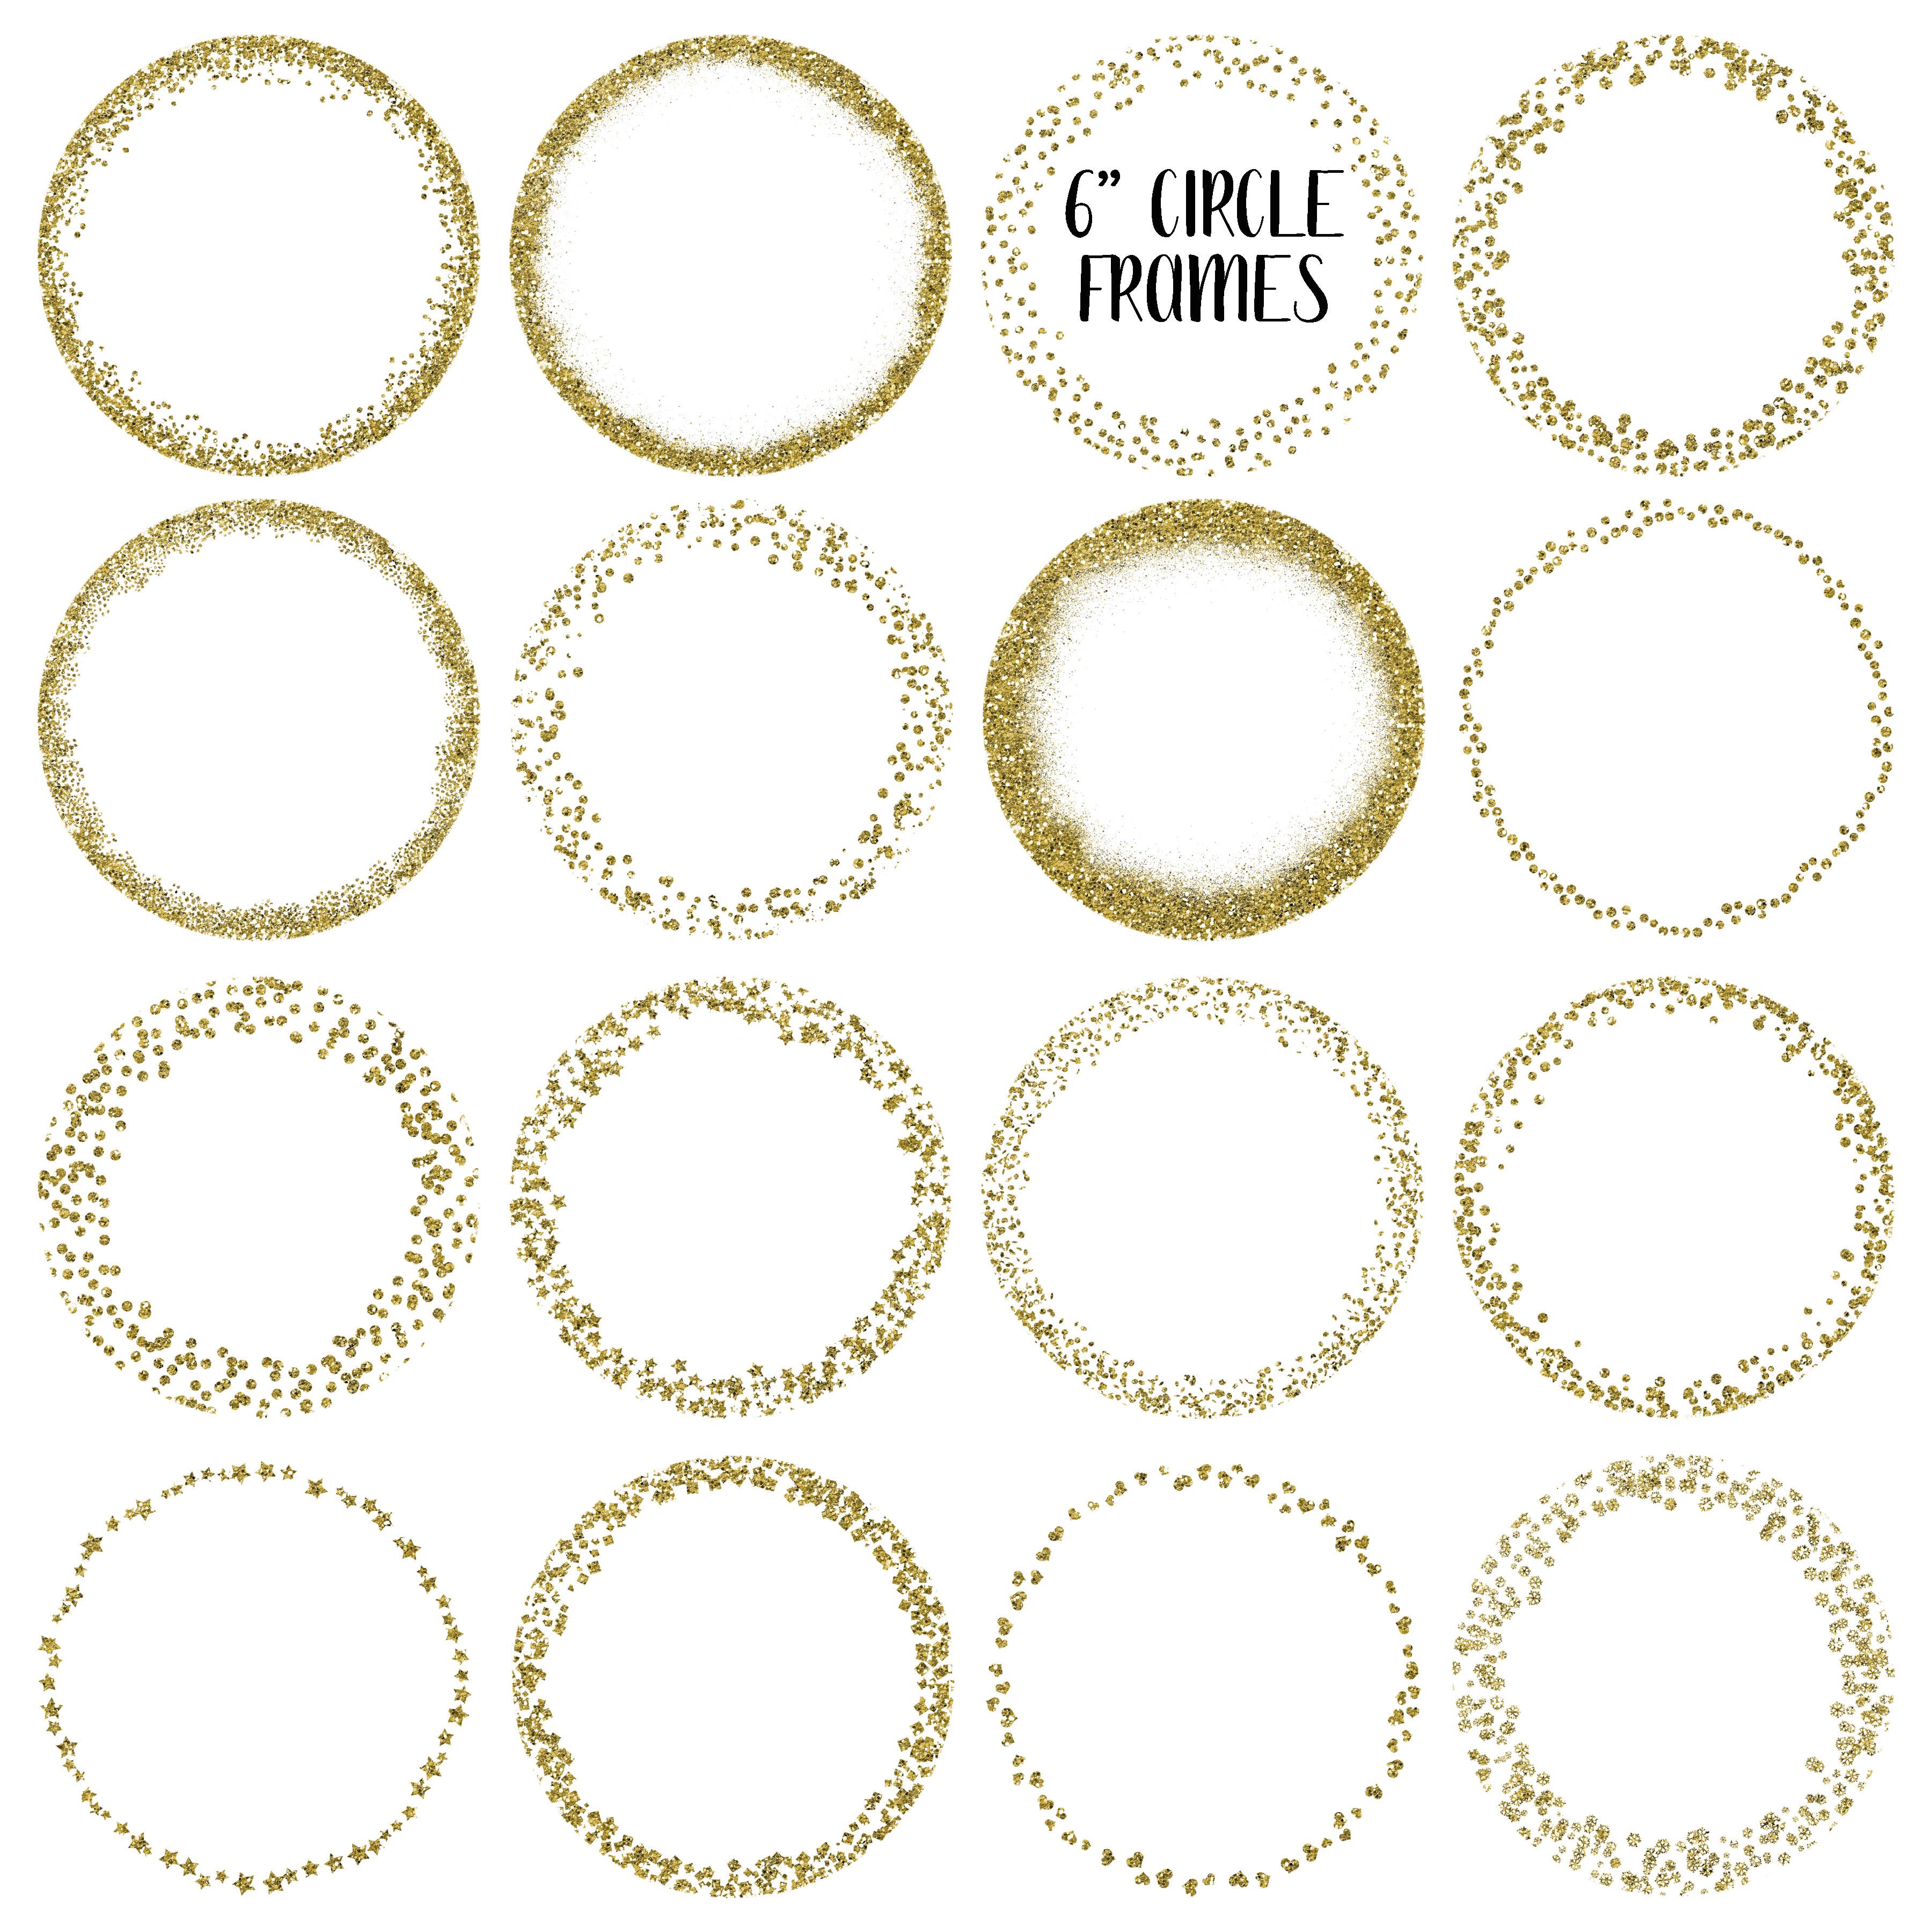 Gold Glitter Frames and Borders PNG Cli | Design Bundles